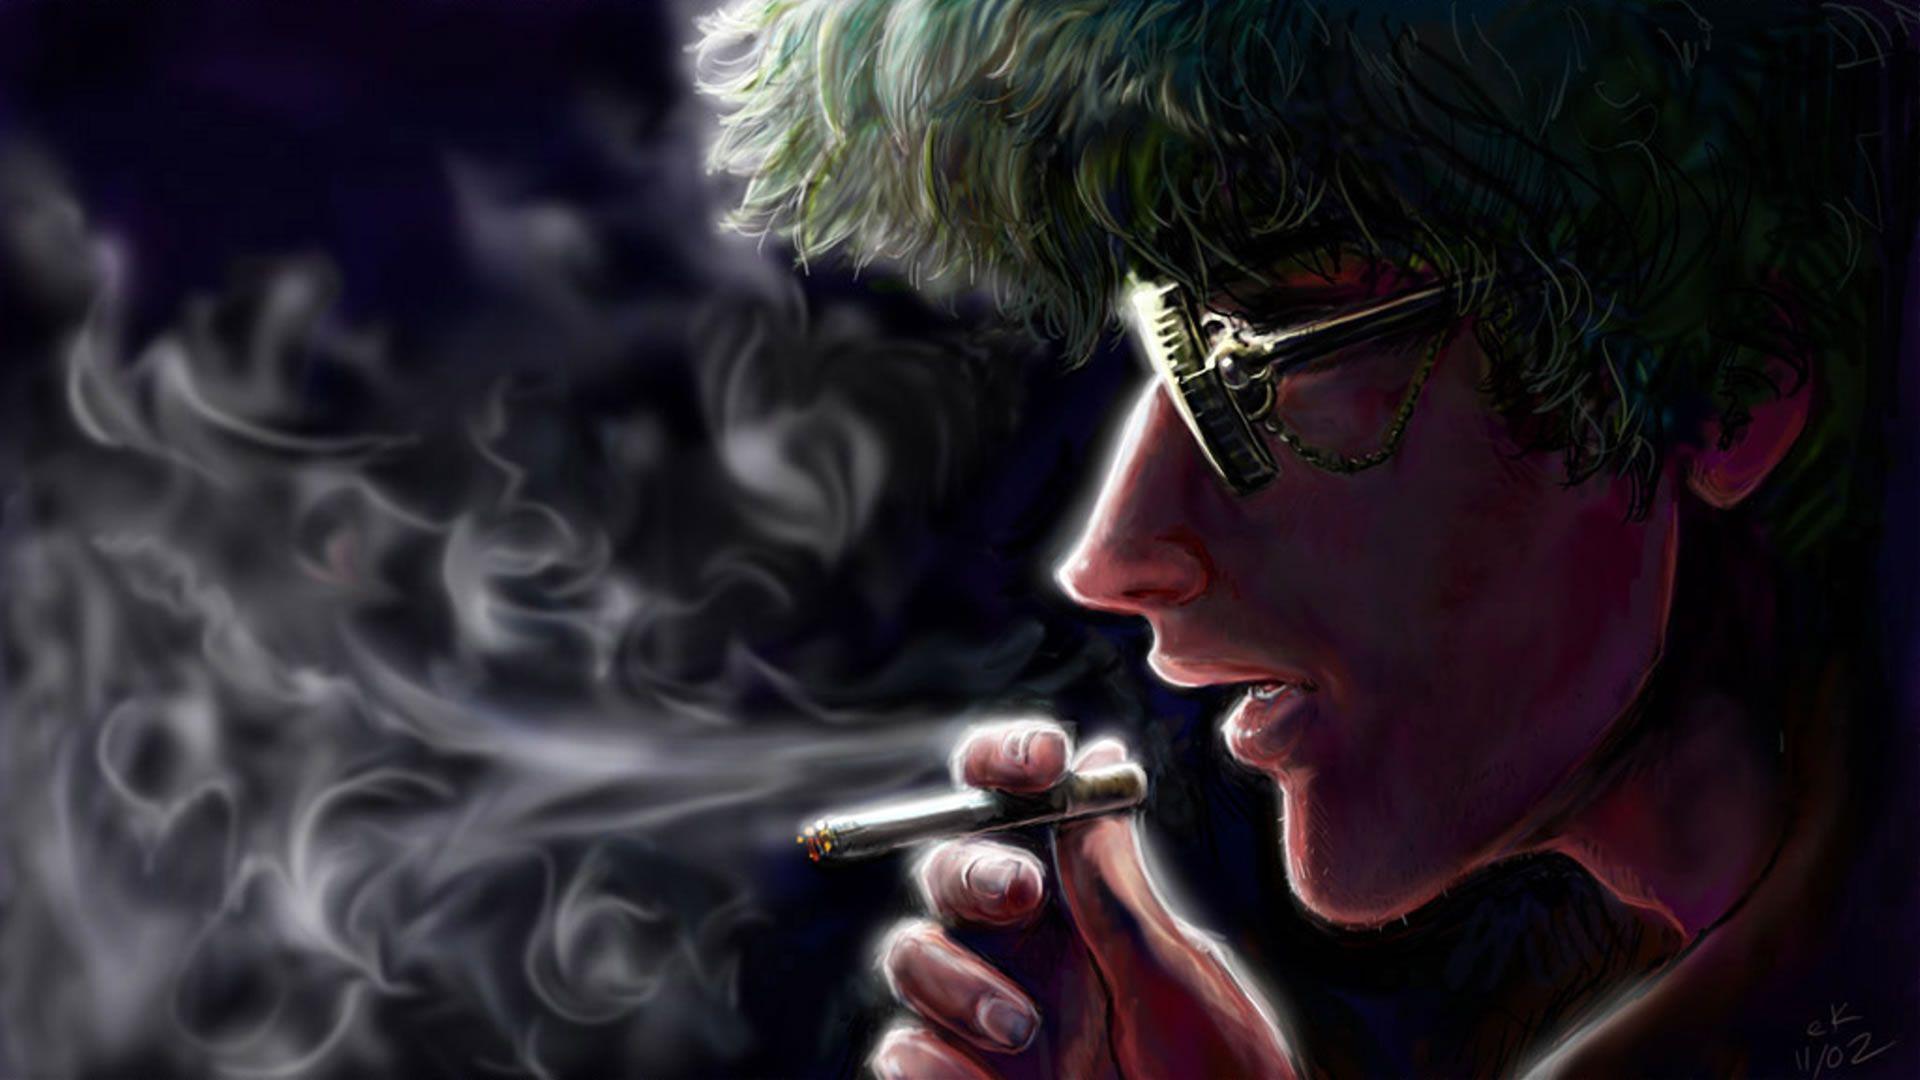 Bebop smoke Cowboy bebop, Anime hd, Anime wallpaper